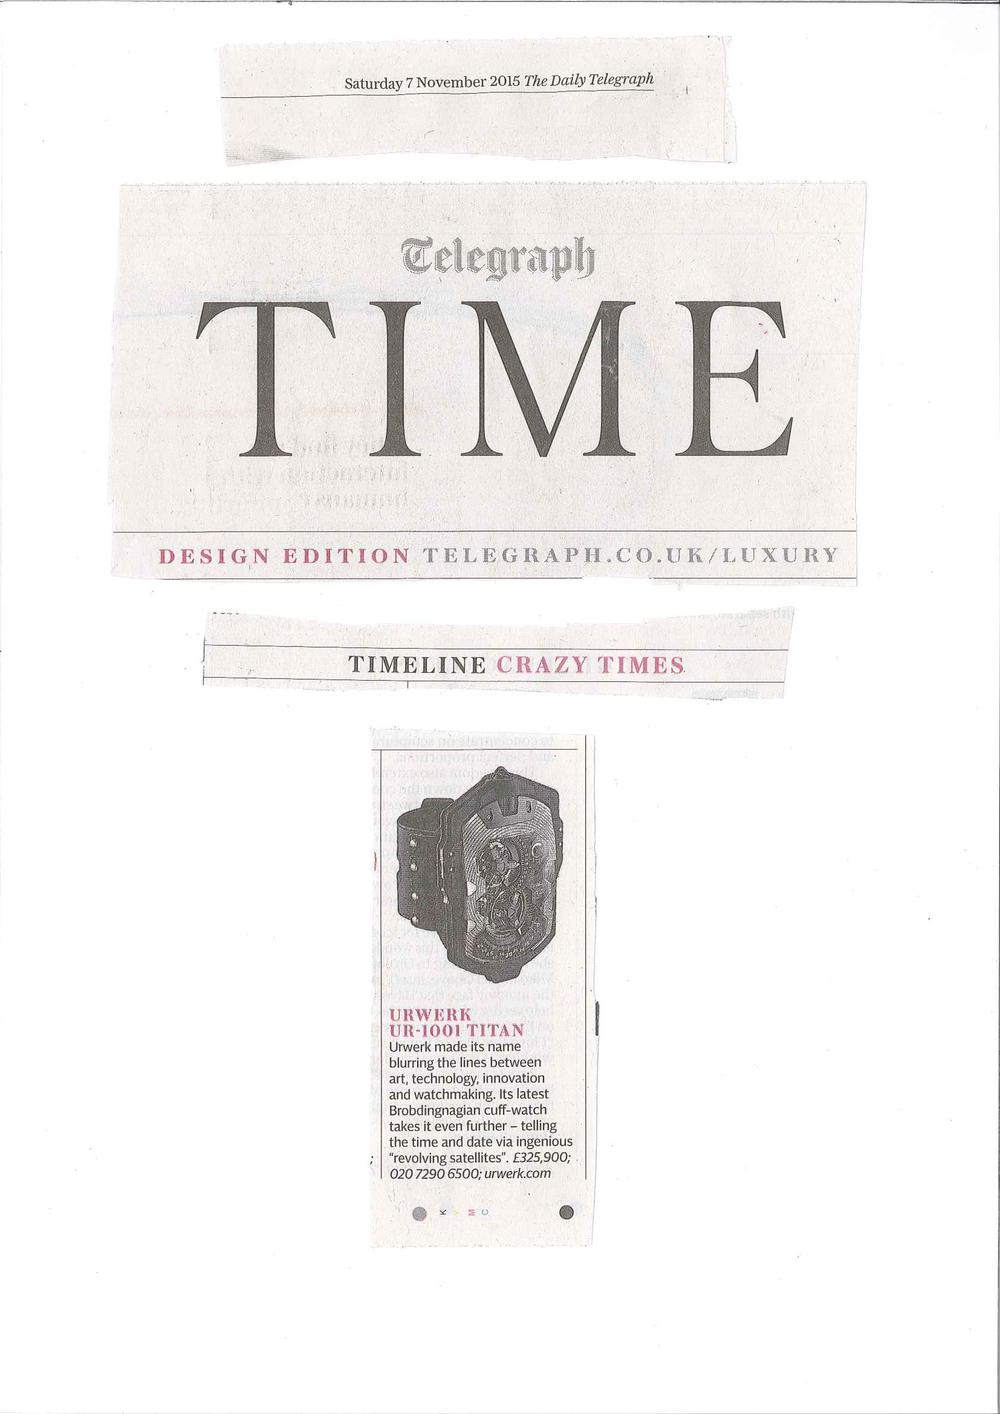 Telegraph Time Nov 15